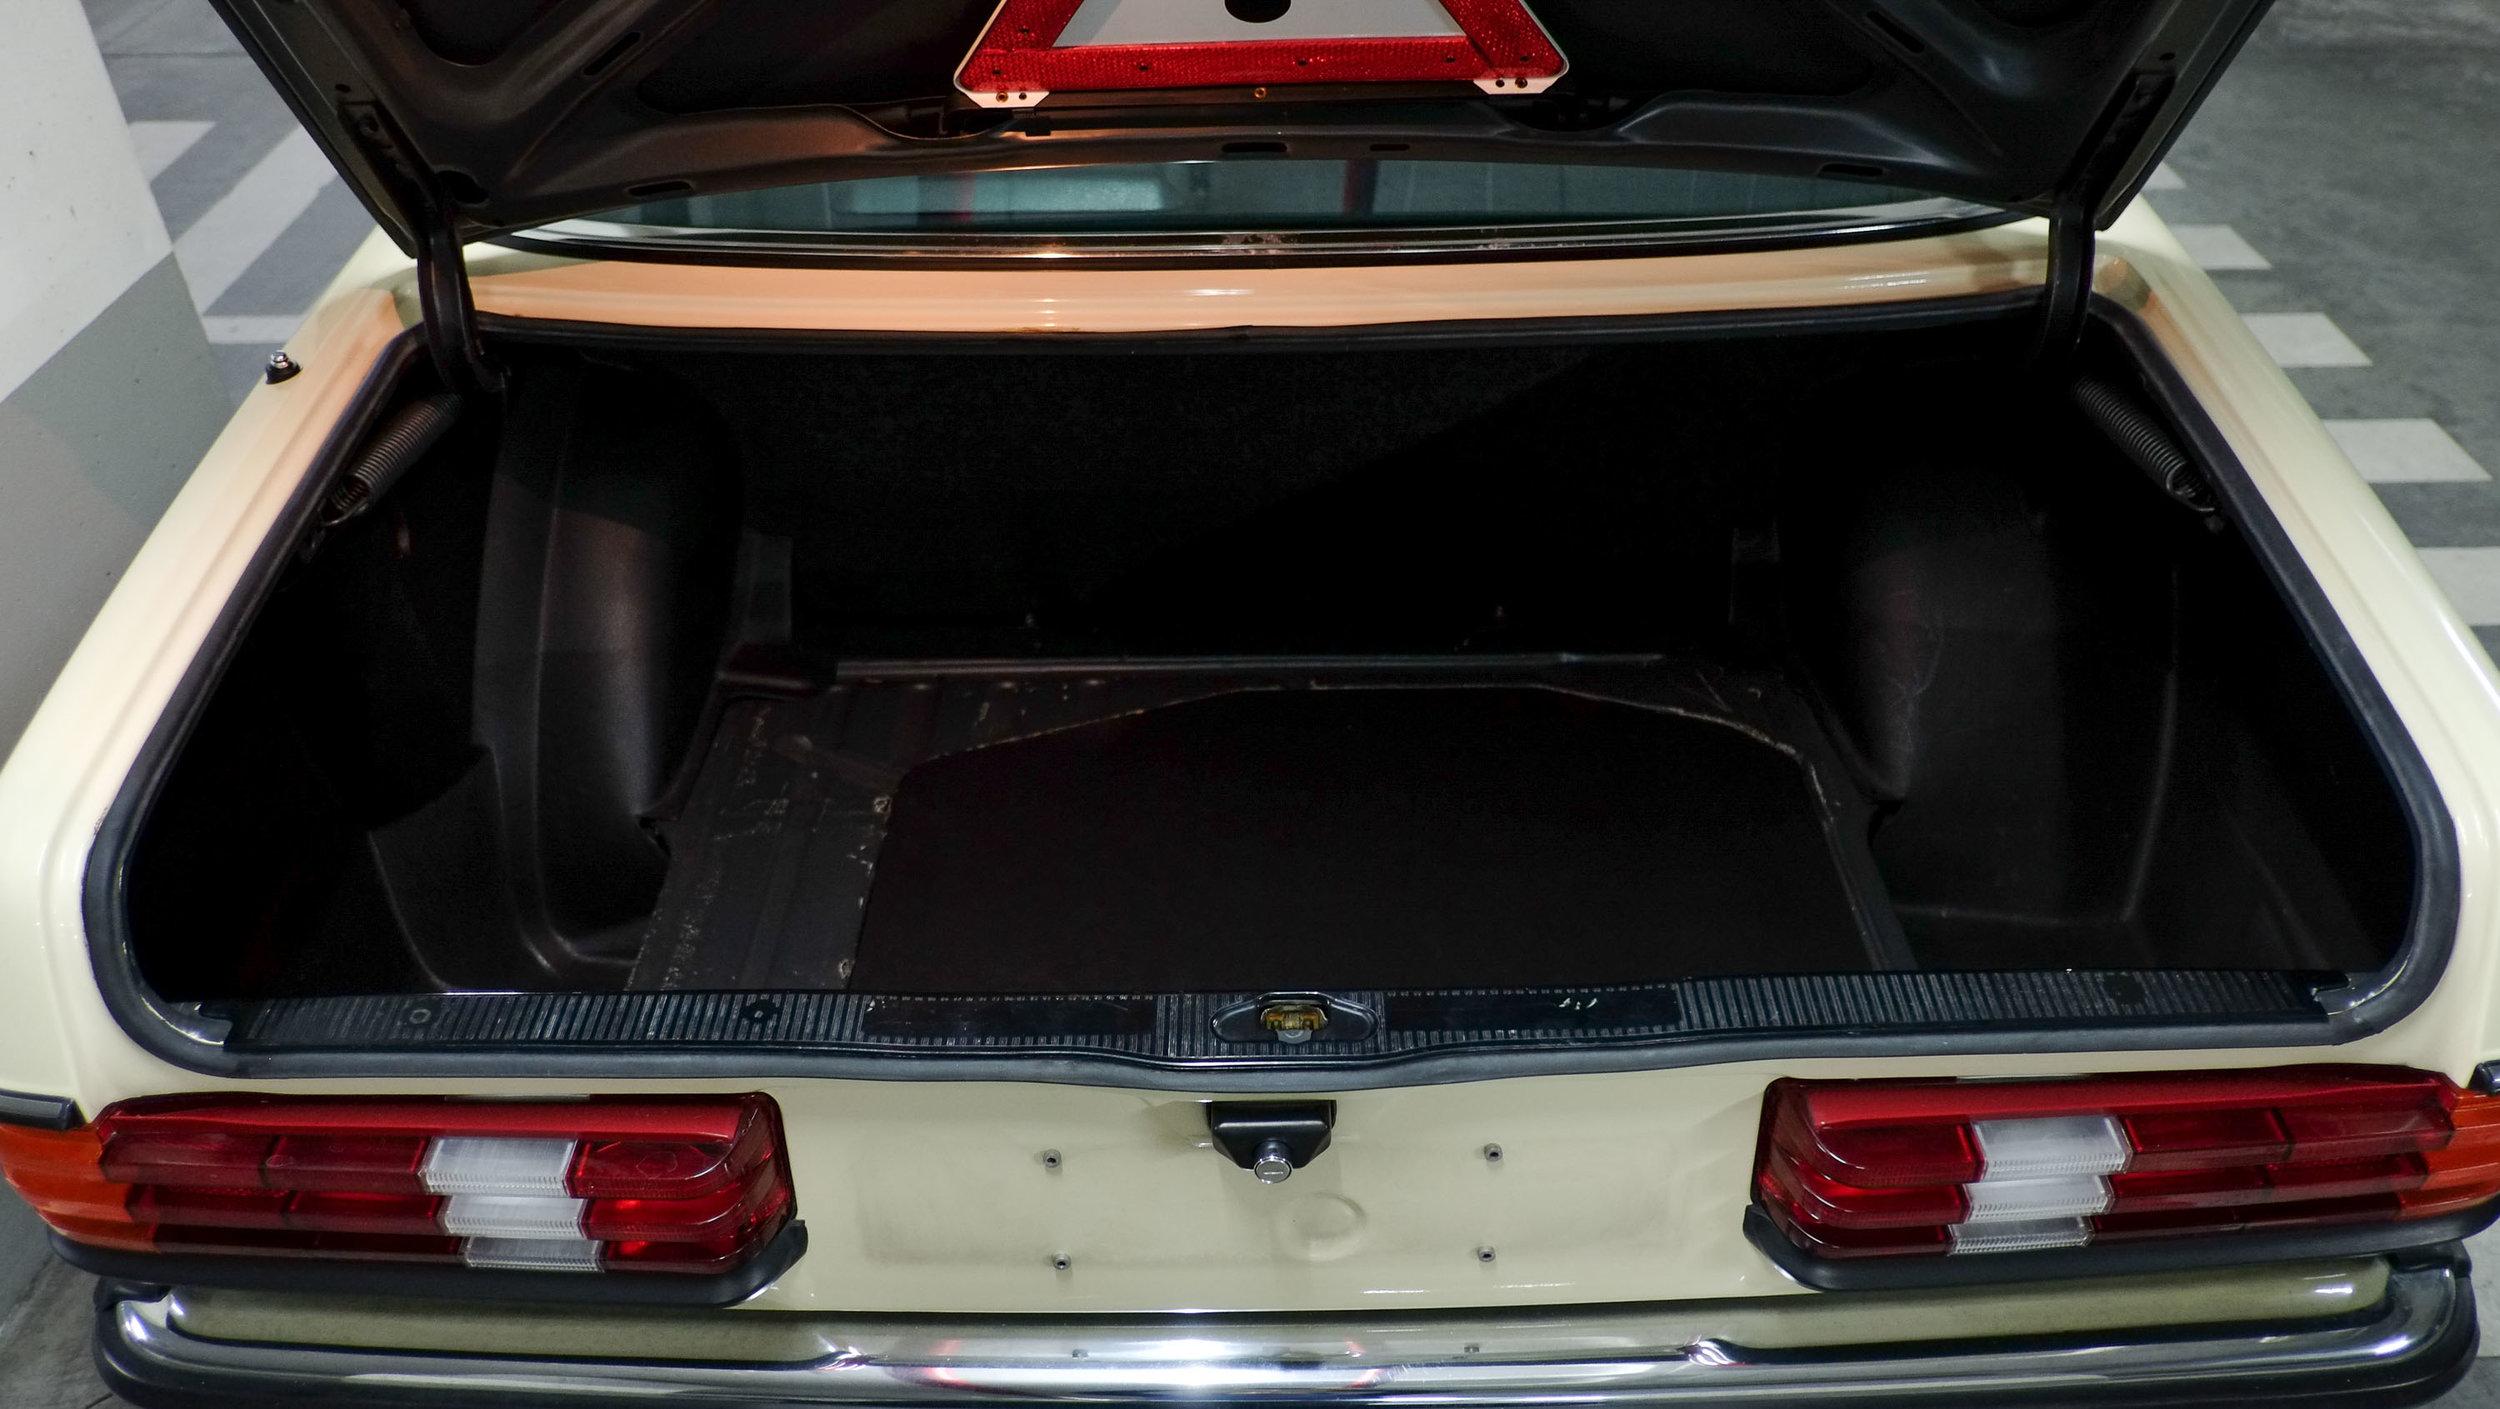 coolnvintage Mercedes-Benz W123 300D (10 of 59).jpg